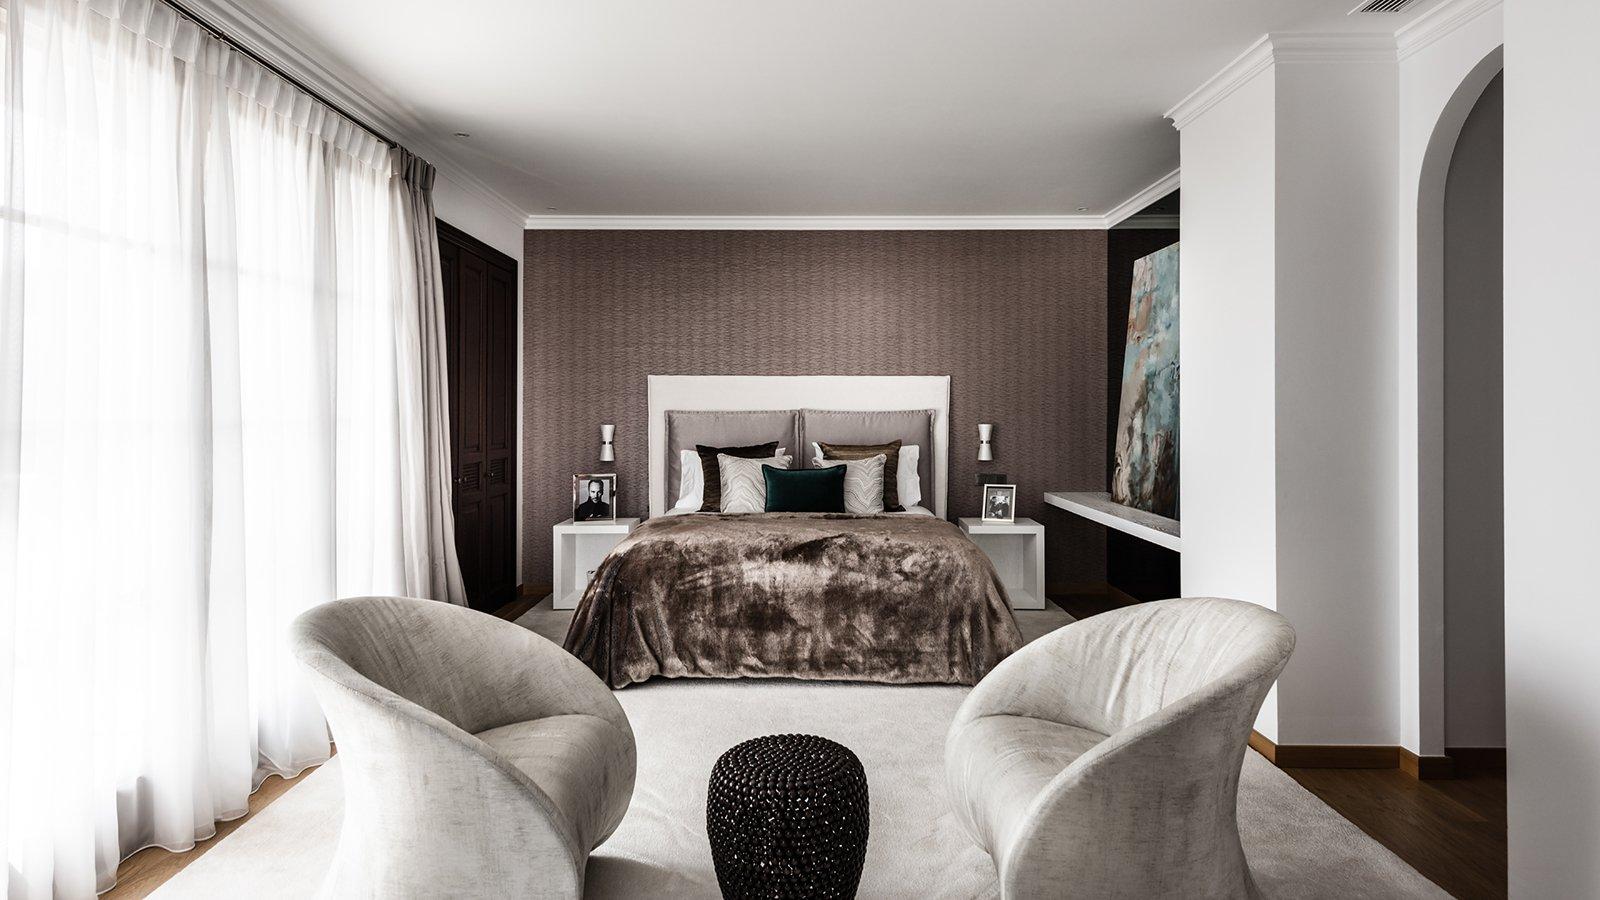 la-zagaleta-ambience-home-design-33